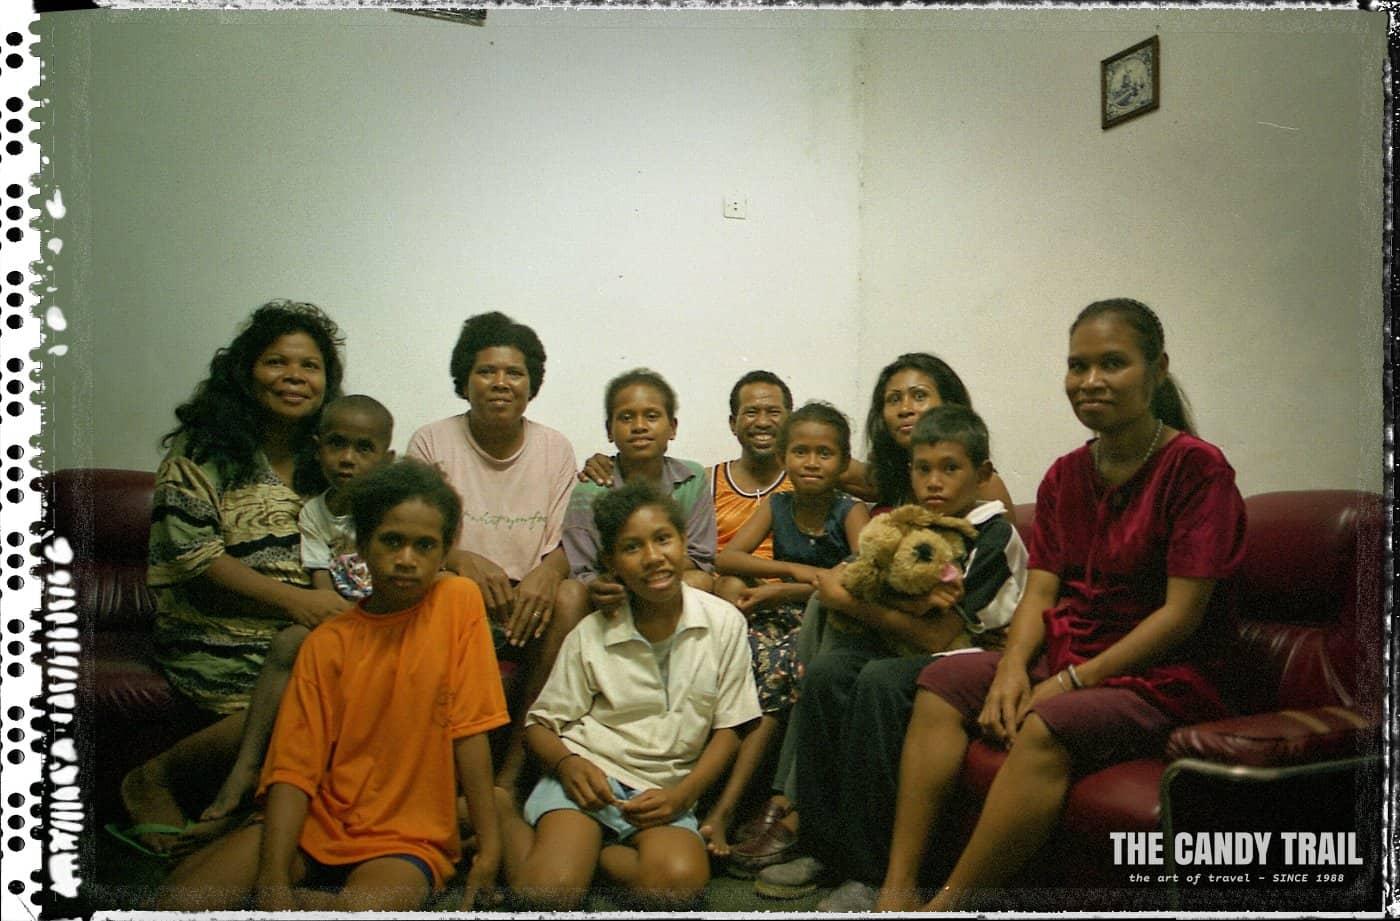 papuan family sarong indonesia 1999